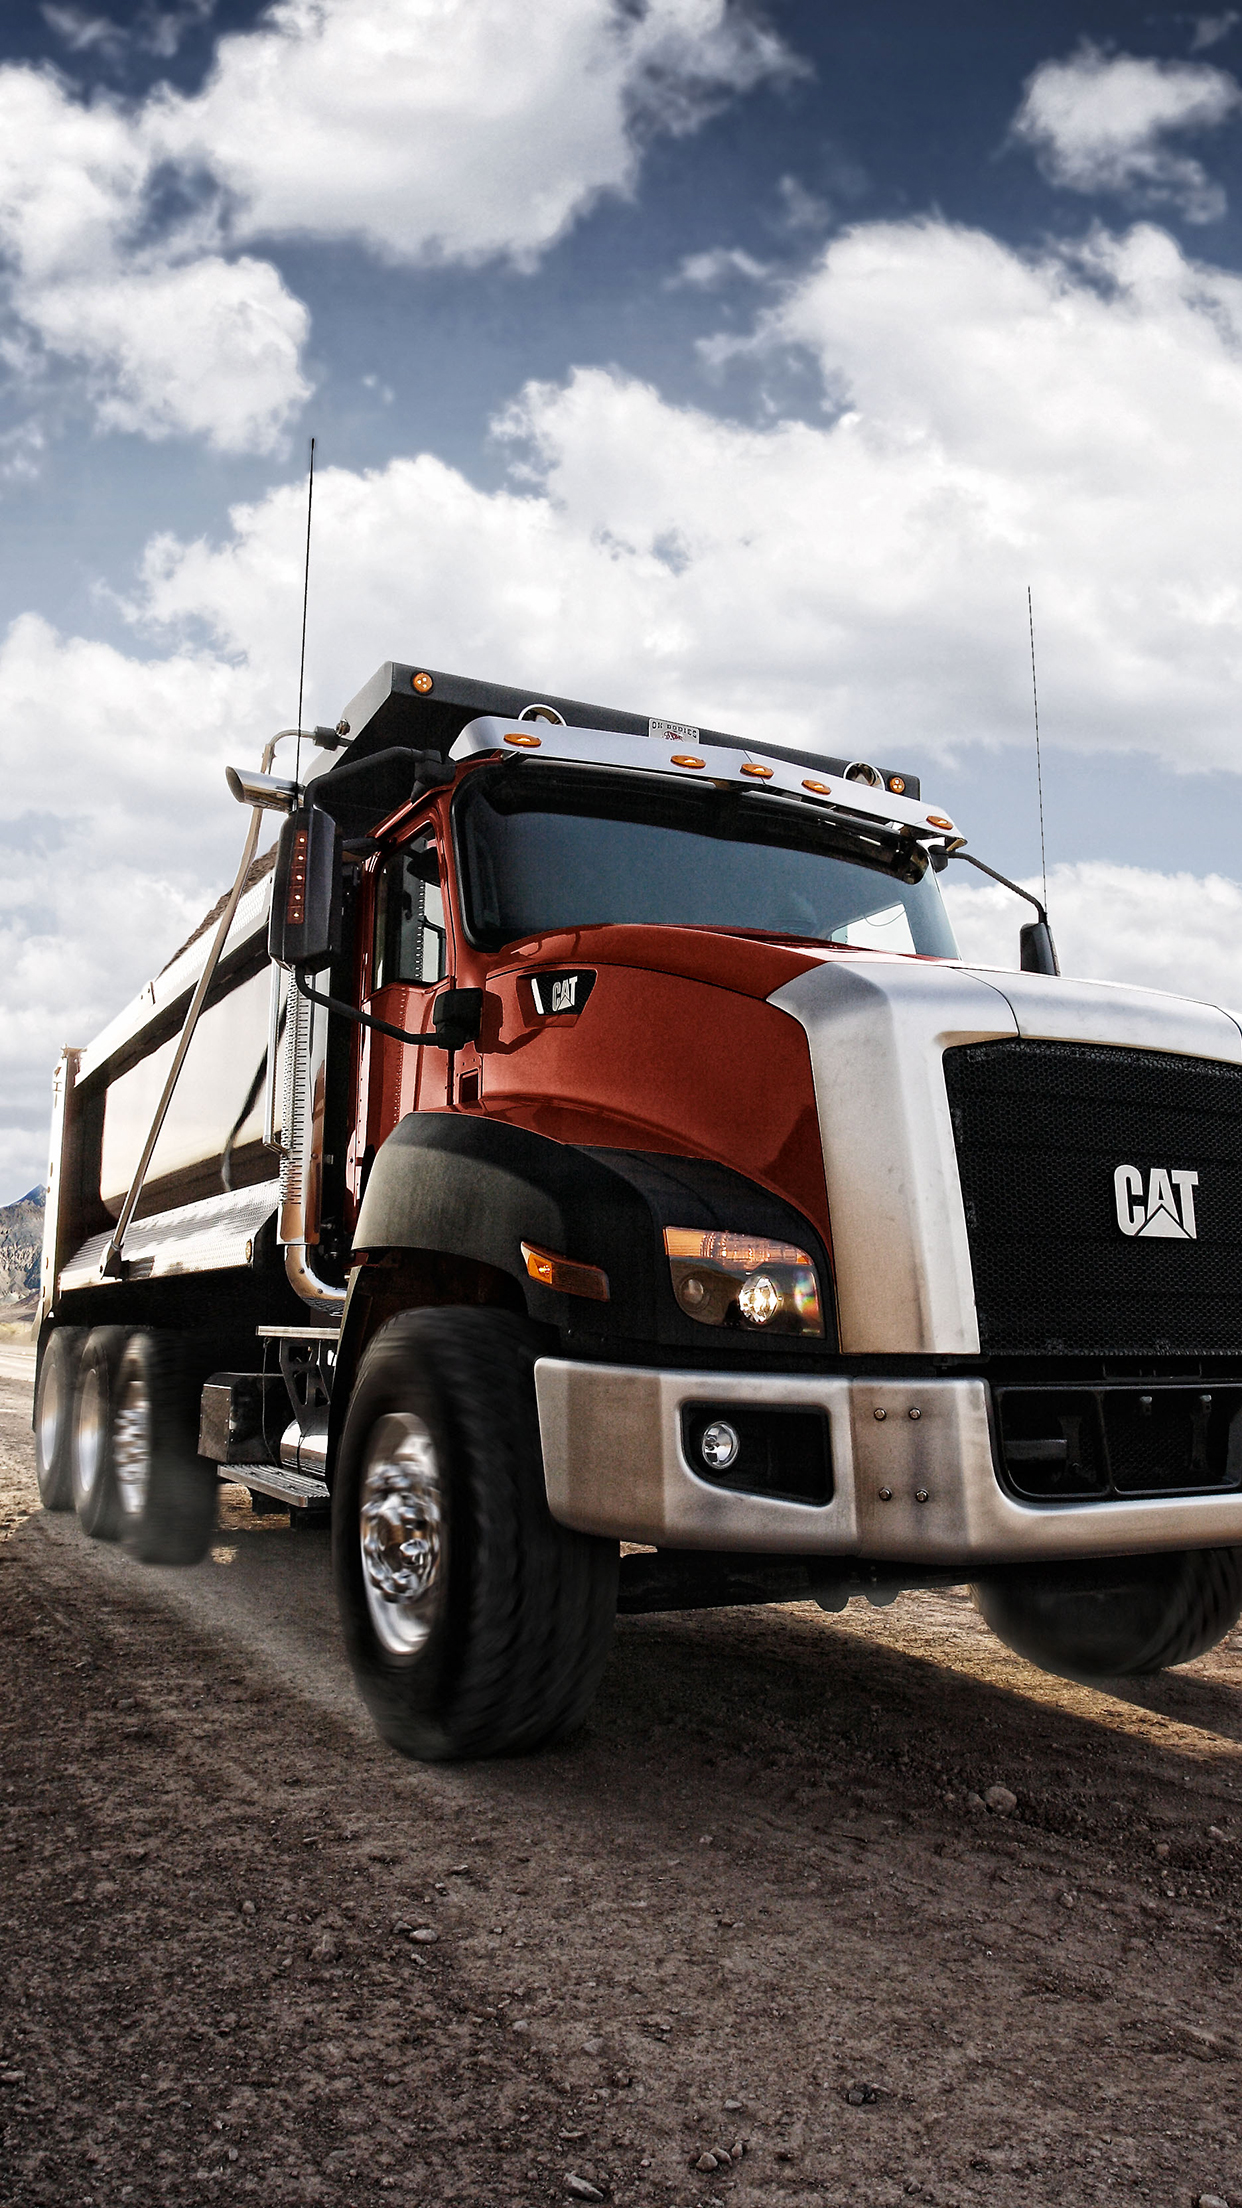 Cat Truck 3Wallpapers iphone Parallax Cat Truck